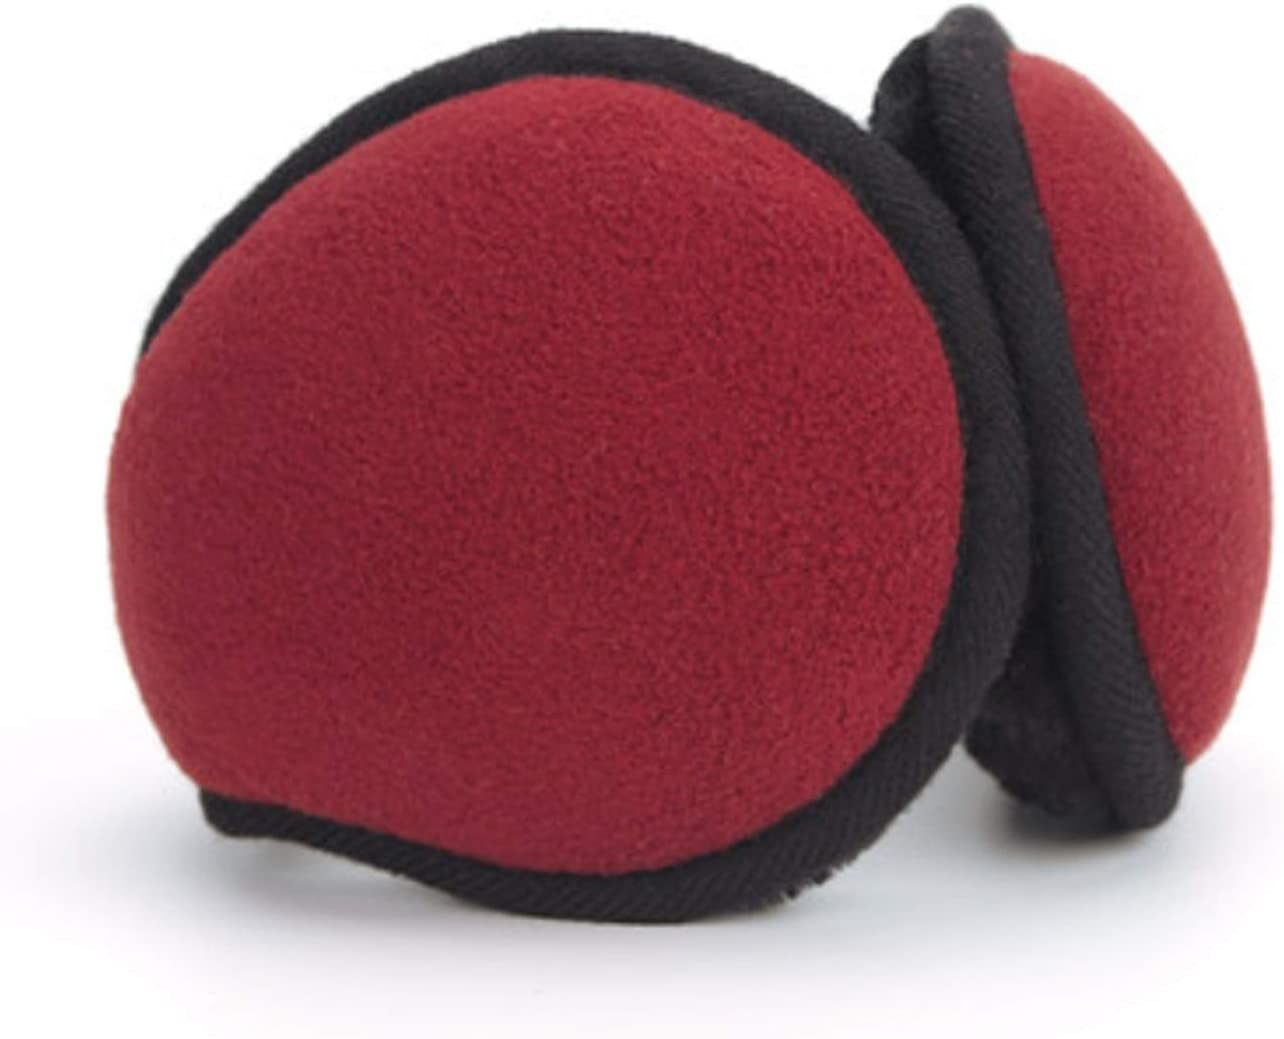 Men's Earmuffs Foldable Ear Warmers Polar Fleece Unisex Winter Warm Ear Protection Comfortable Outdoor Skiing and Biking (Color : Red)